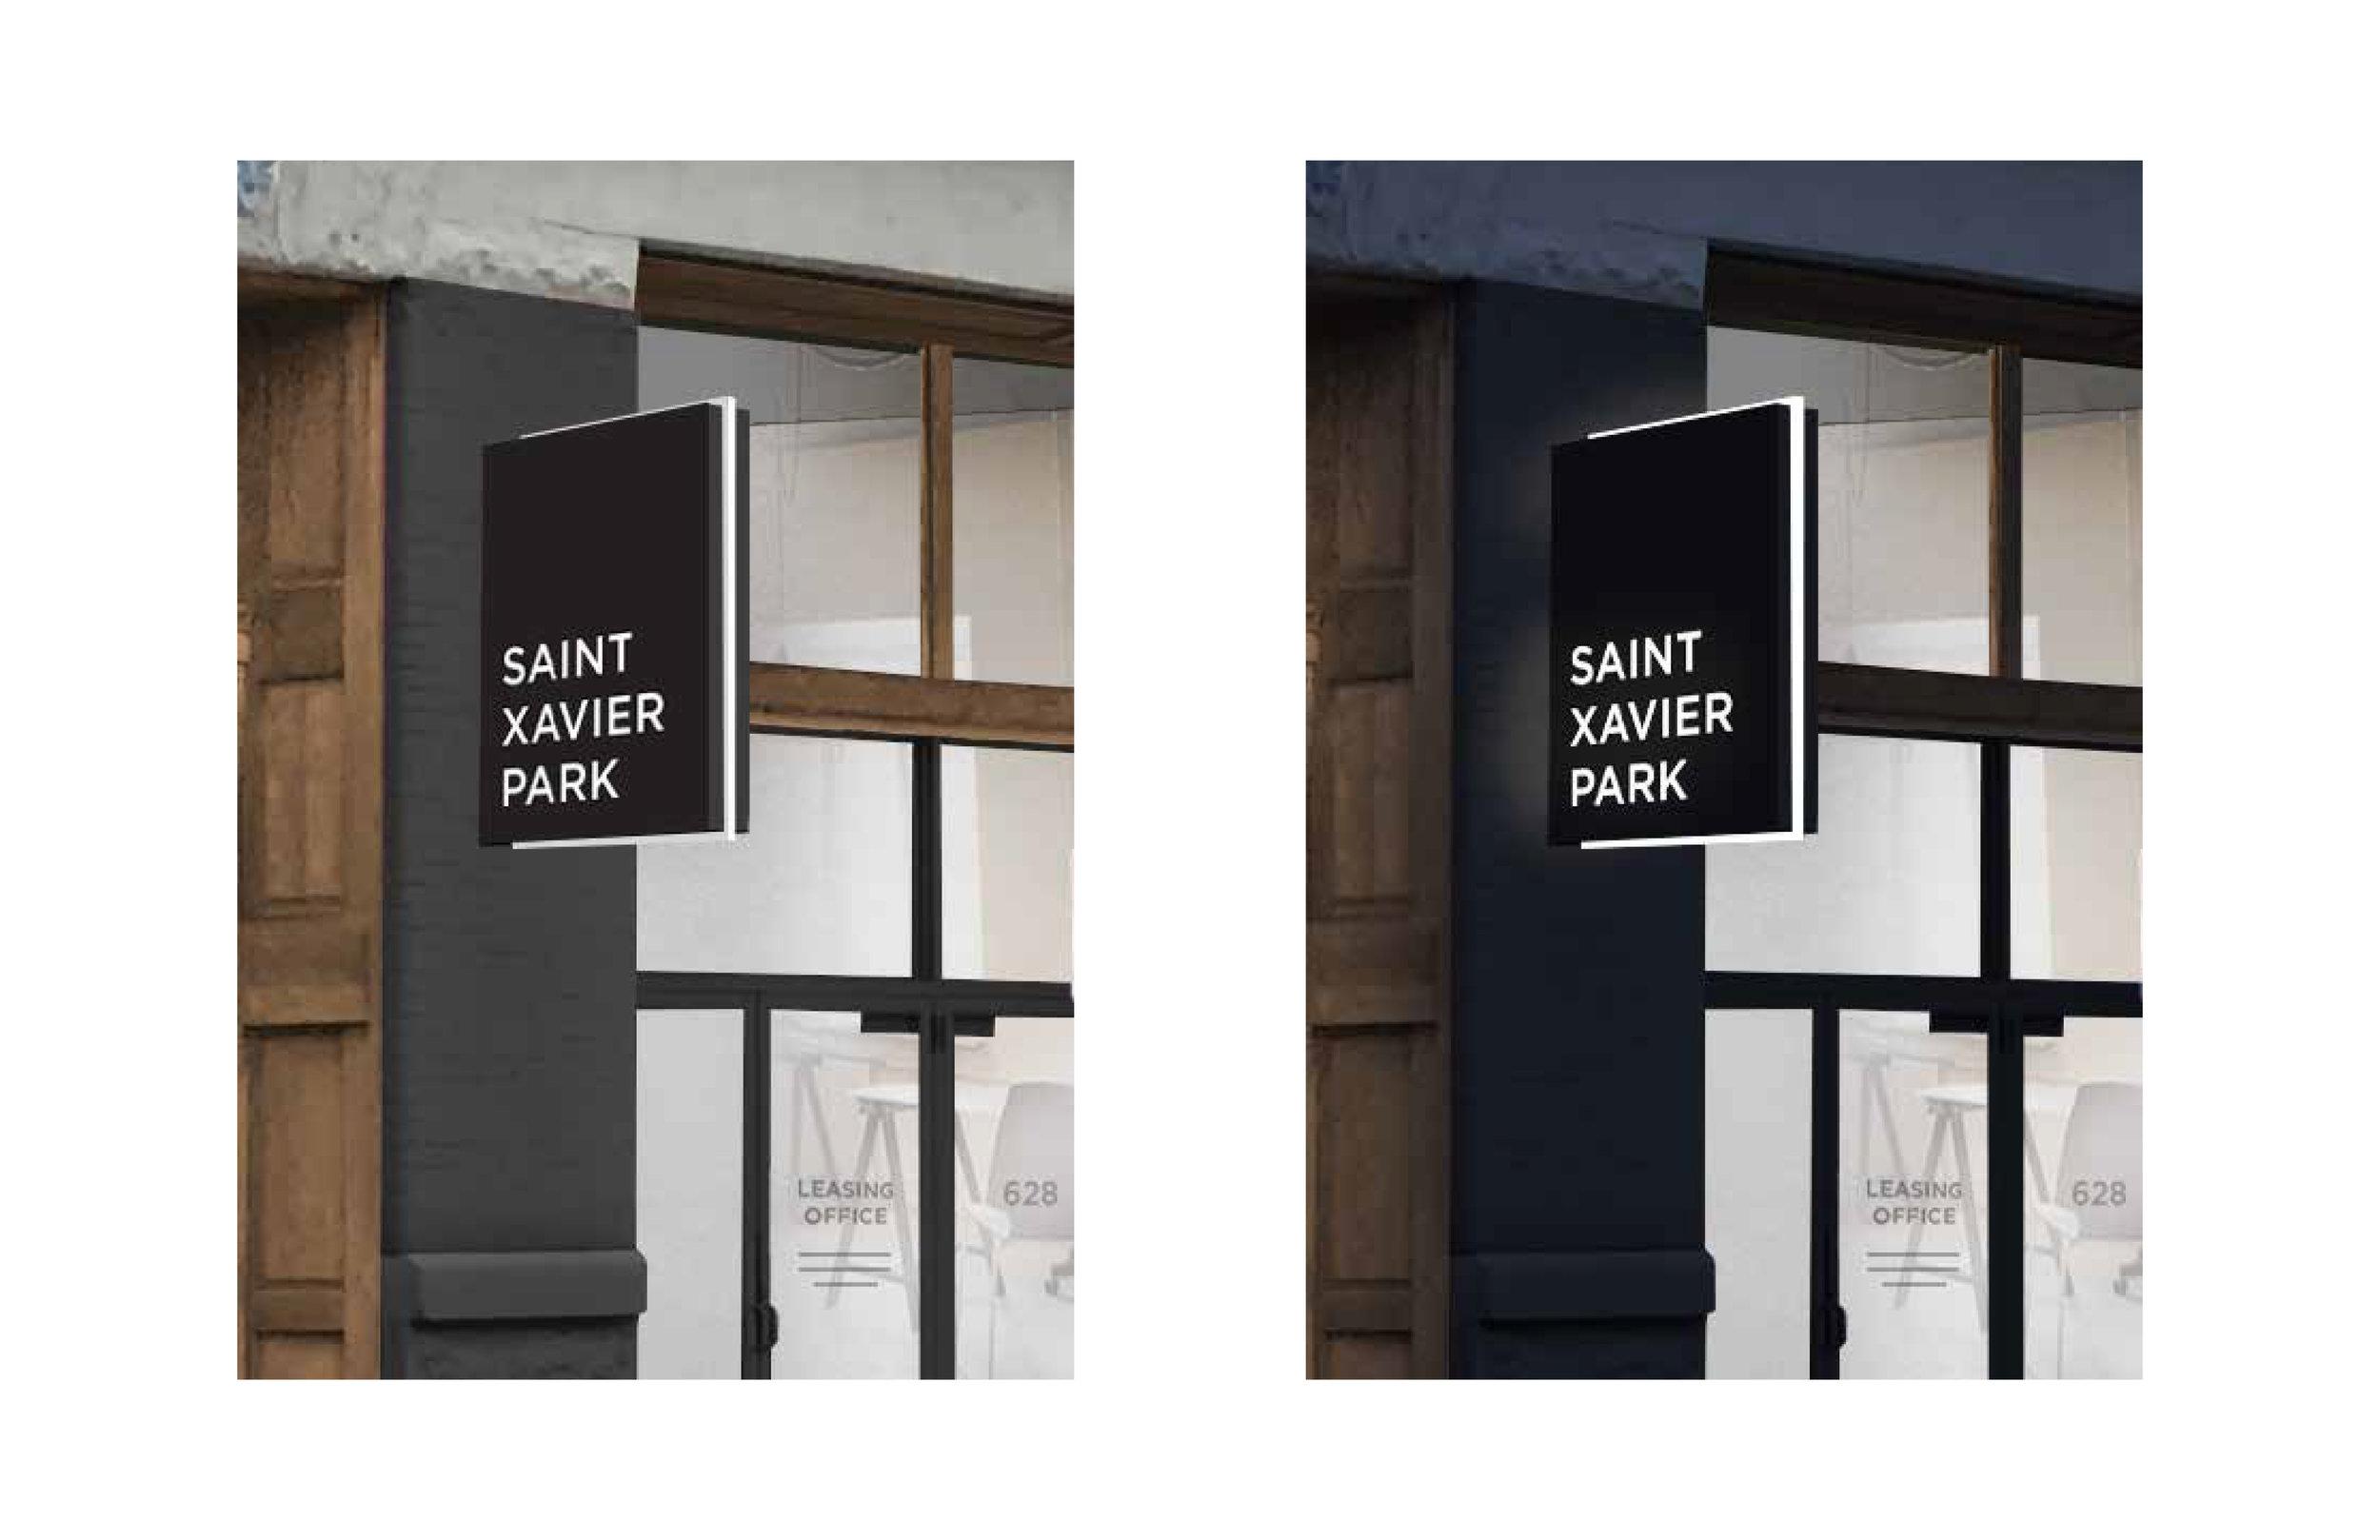 Exterior Signage Mock-Up